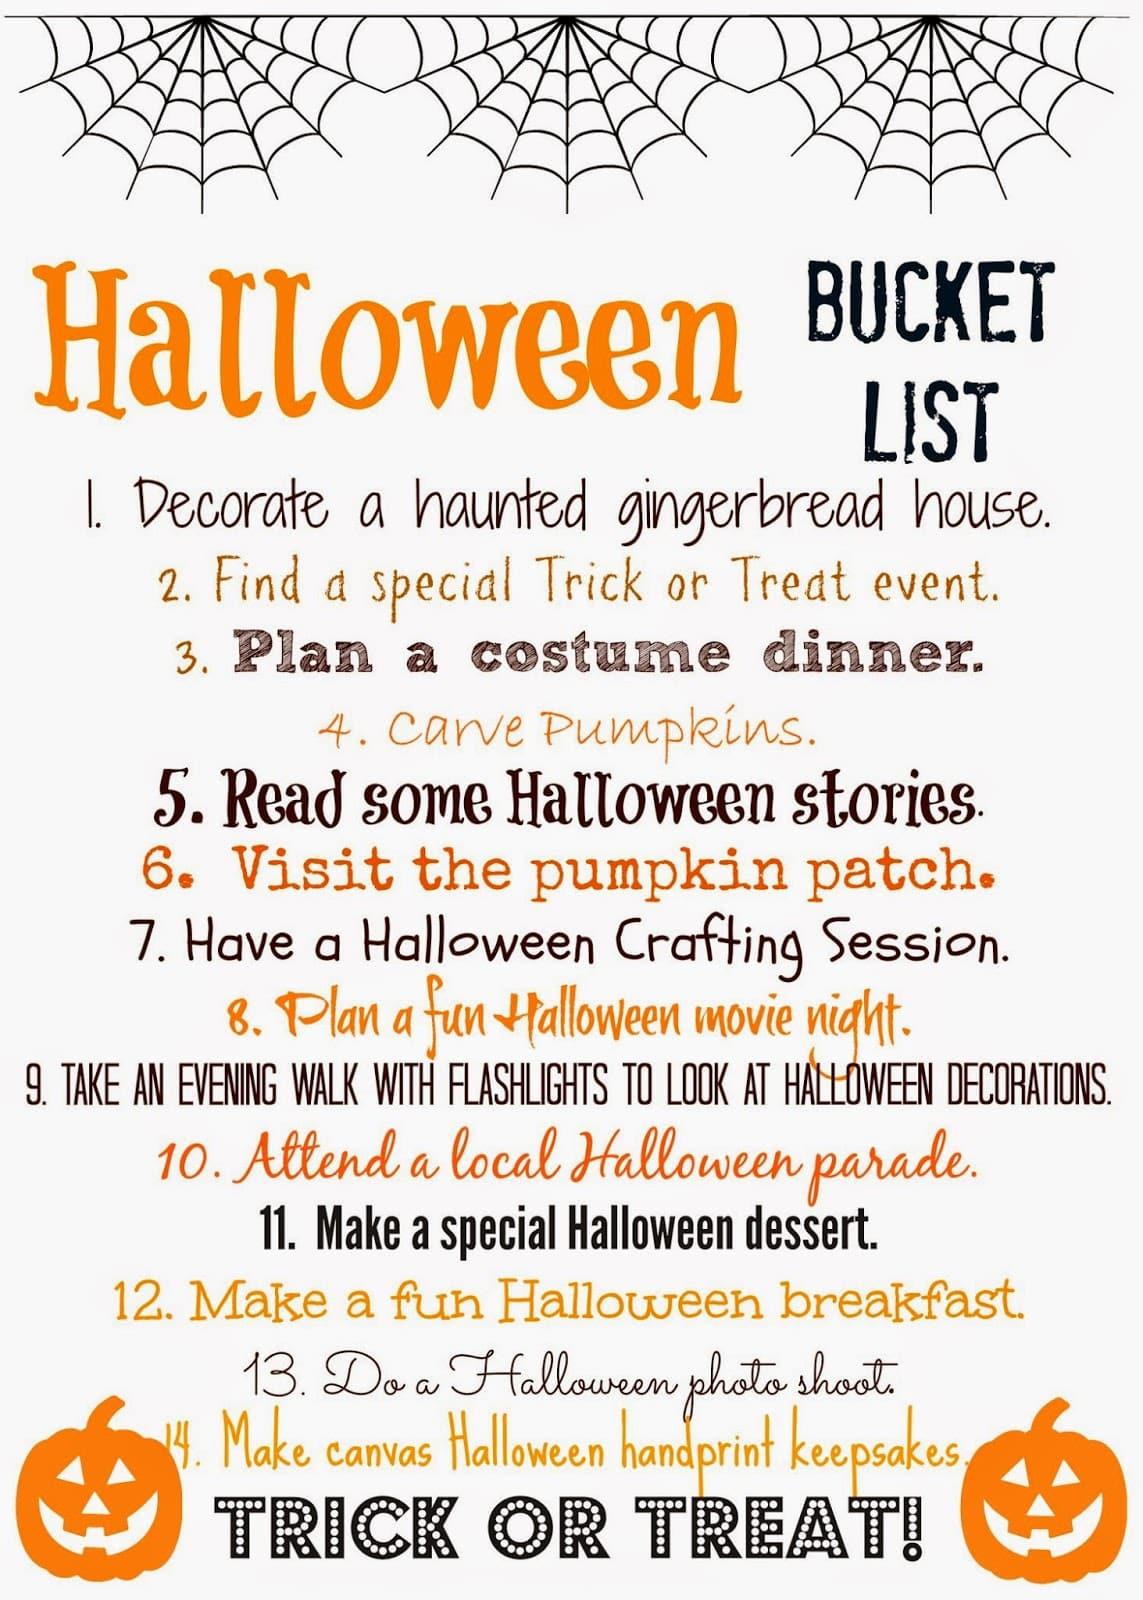 Halloween Bucket List Free Printable